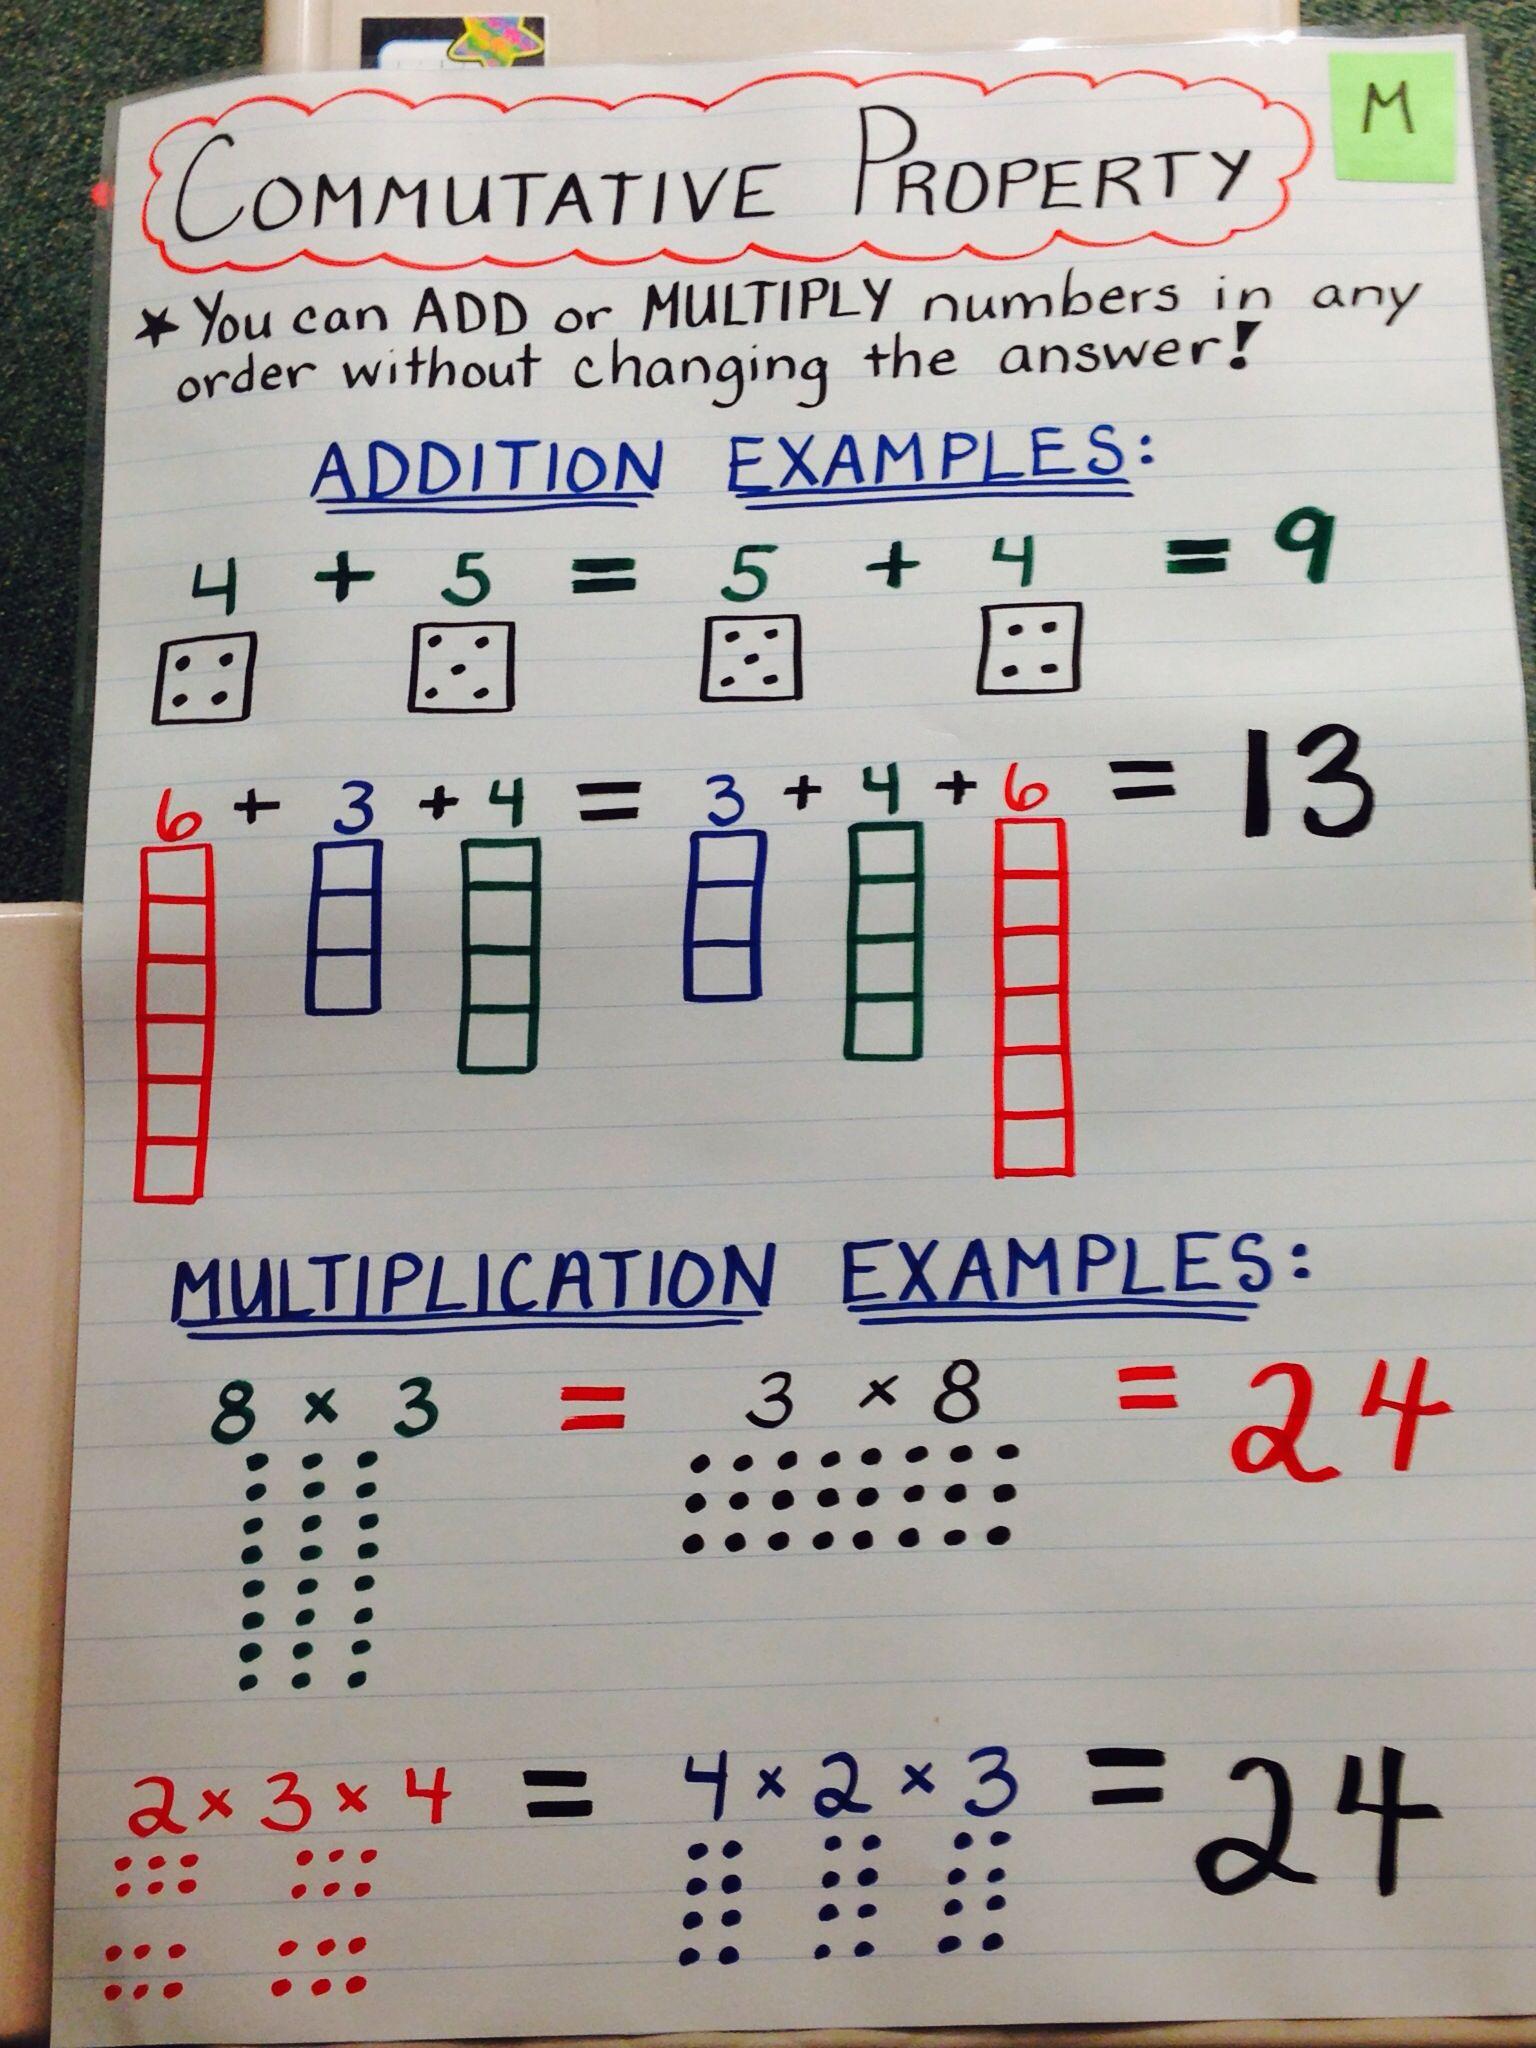 Math Anchor Chart Commutative Property Math Charts Anchor Charts Math Anchor Chart Commutative property of addition and